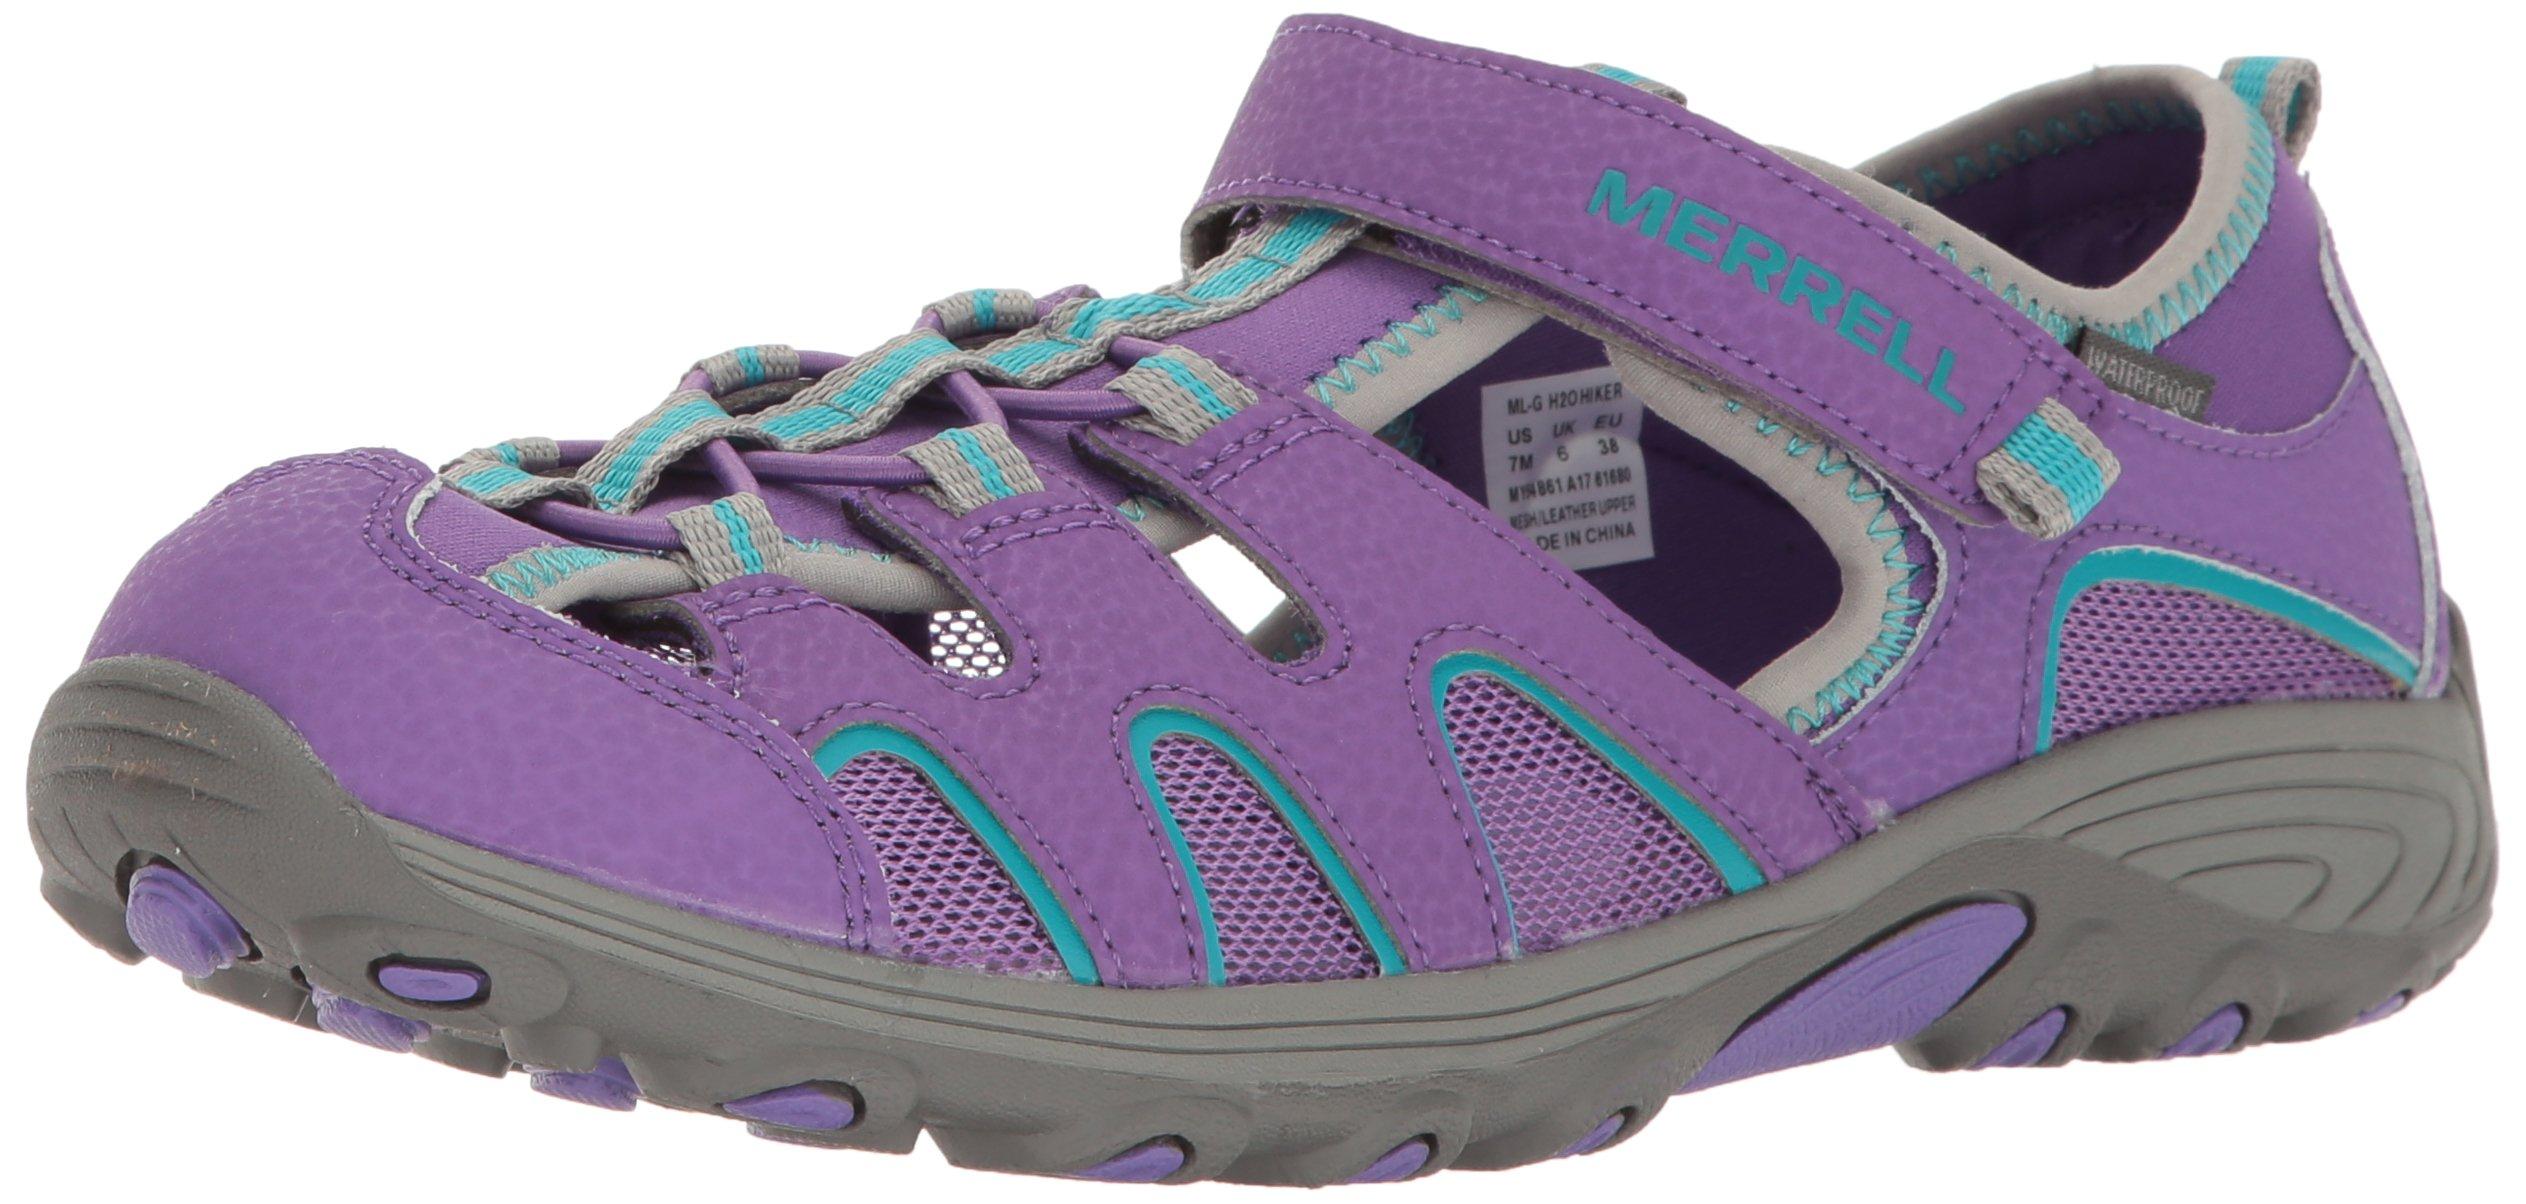 Merrell Girls' Hydro H2O Hiker Sandal Sport, Purple, 1 Medium US Little Kid